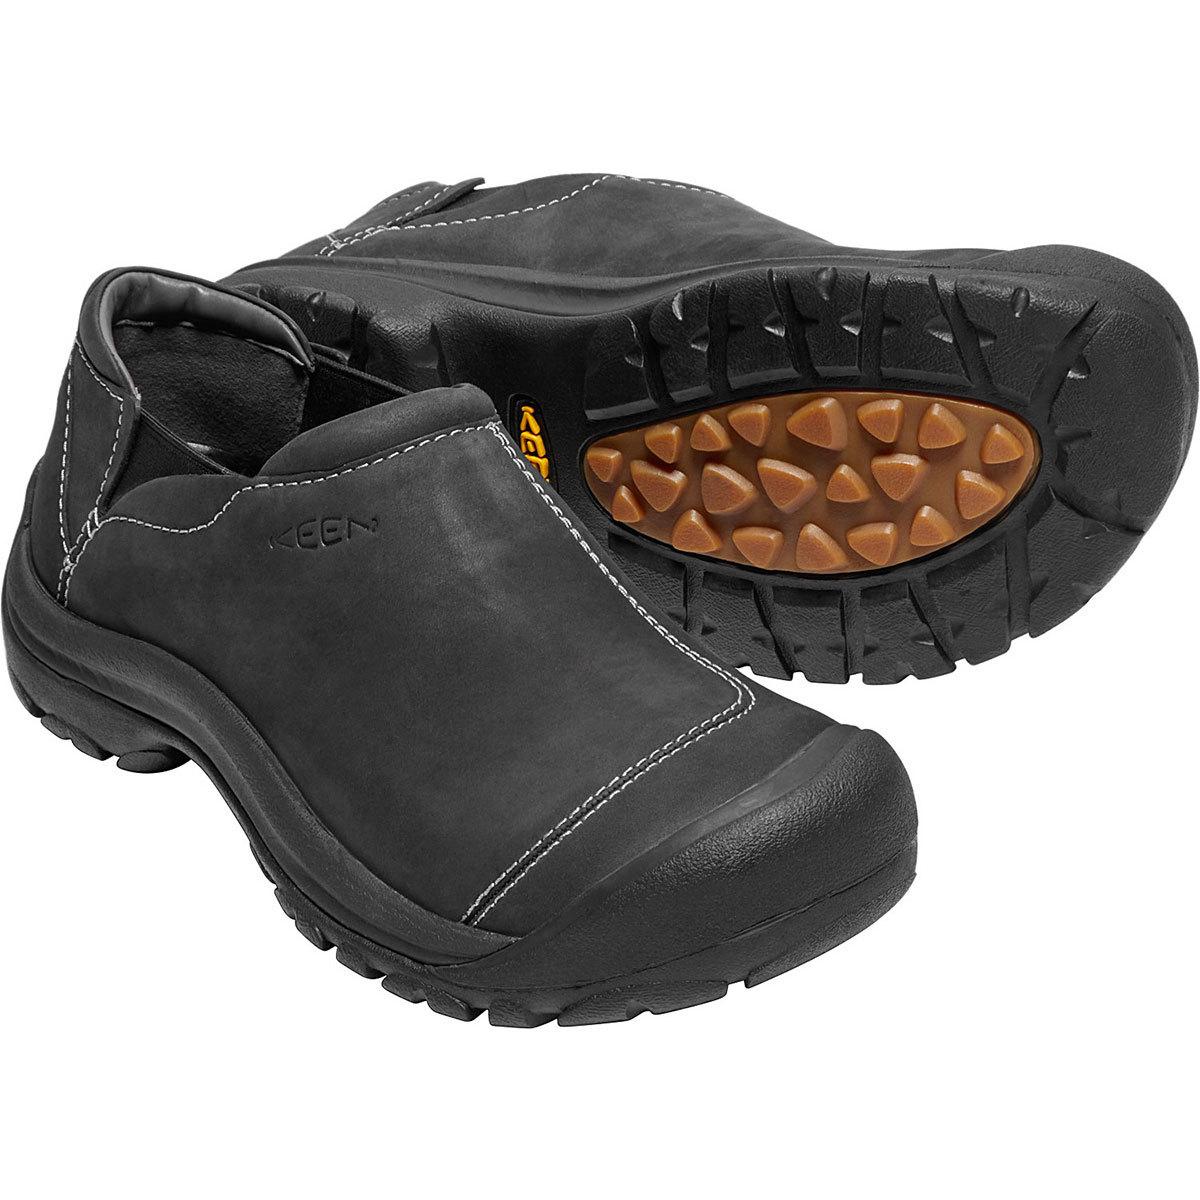 KEEN Men's Ashland Slip-On Casual Shoes